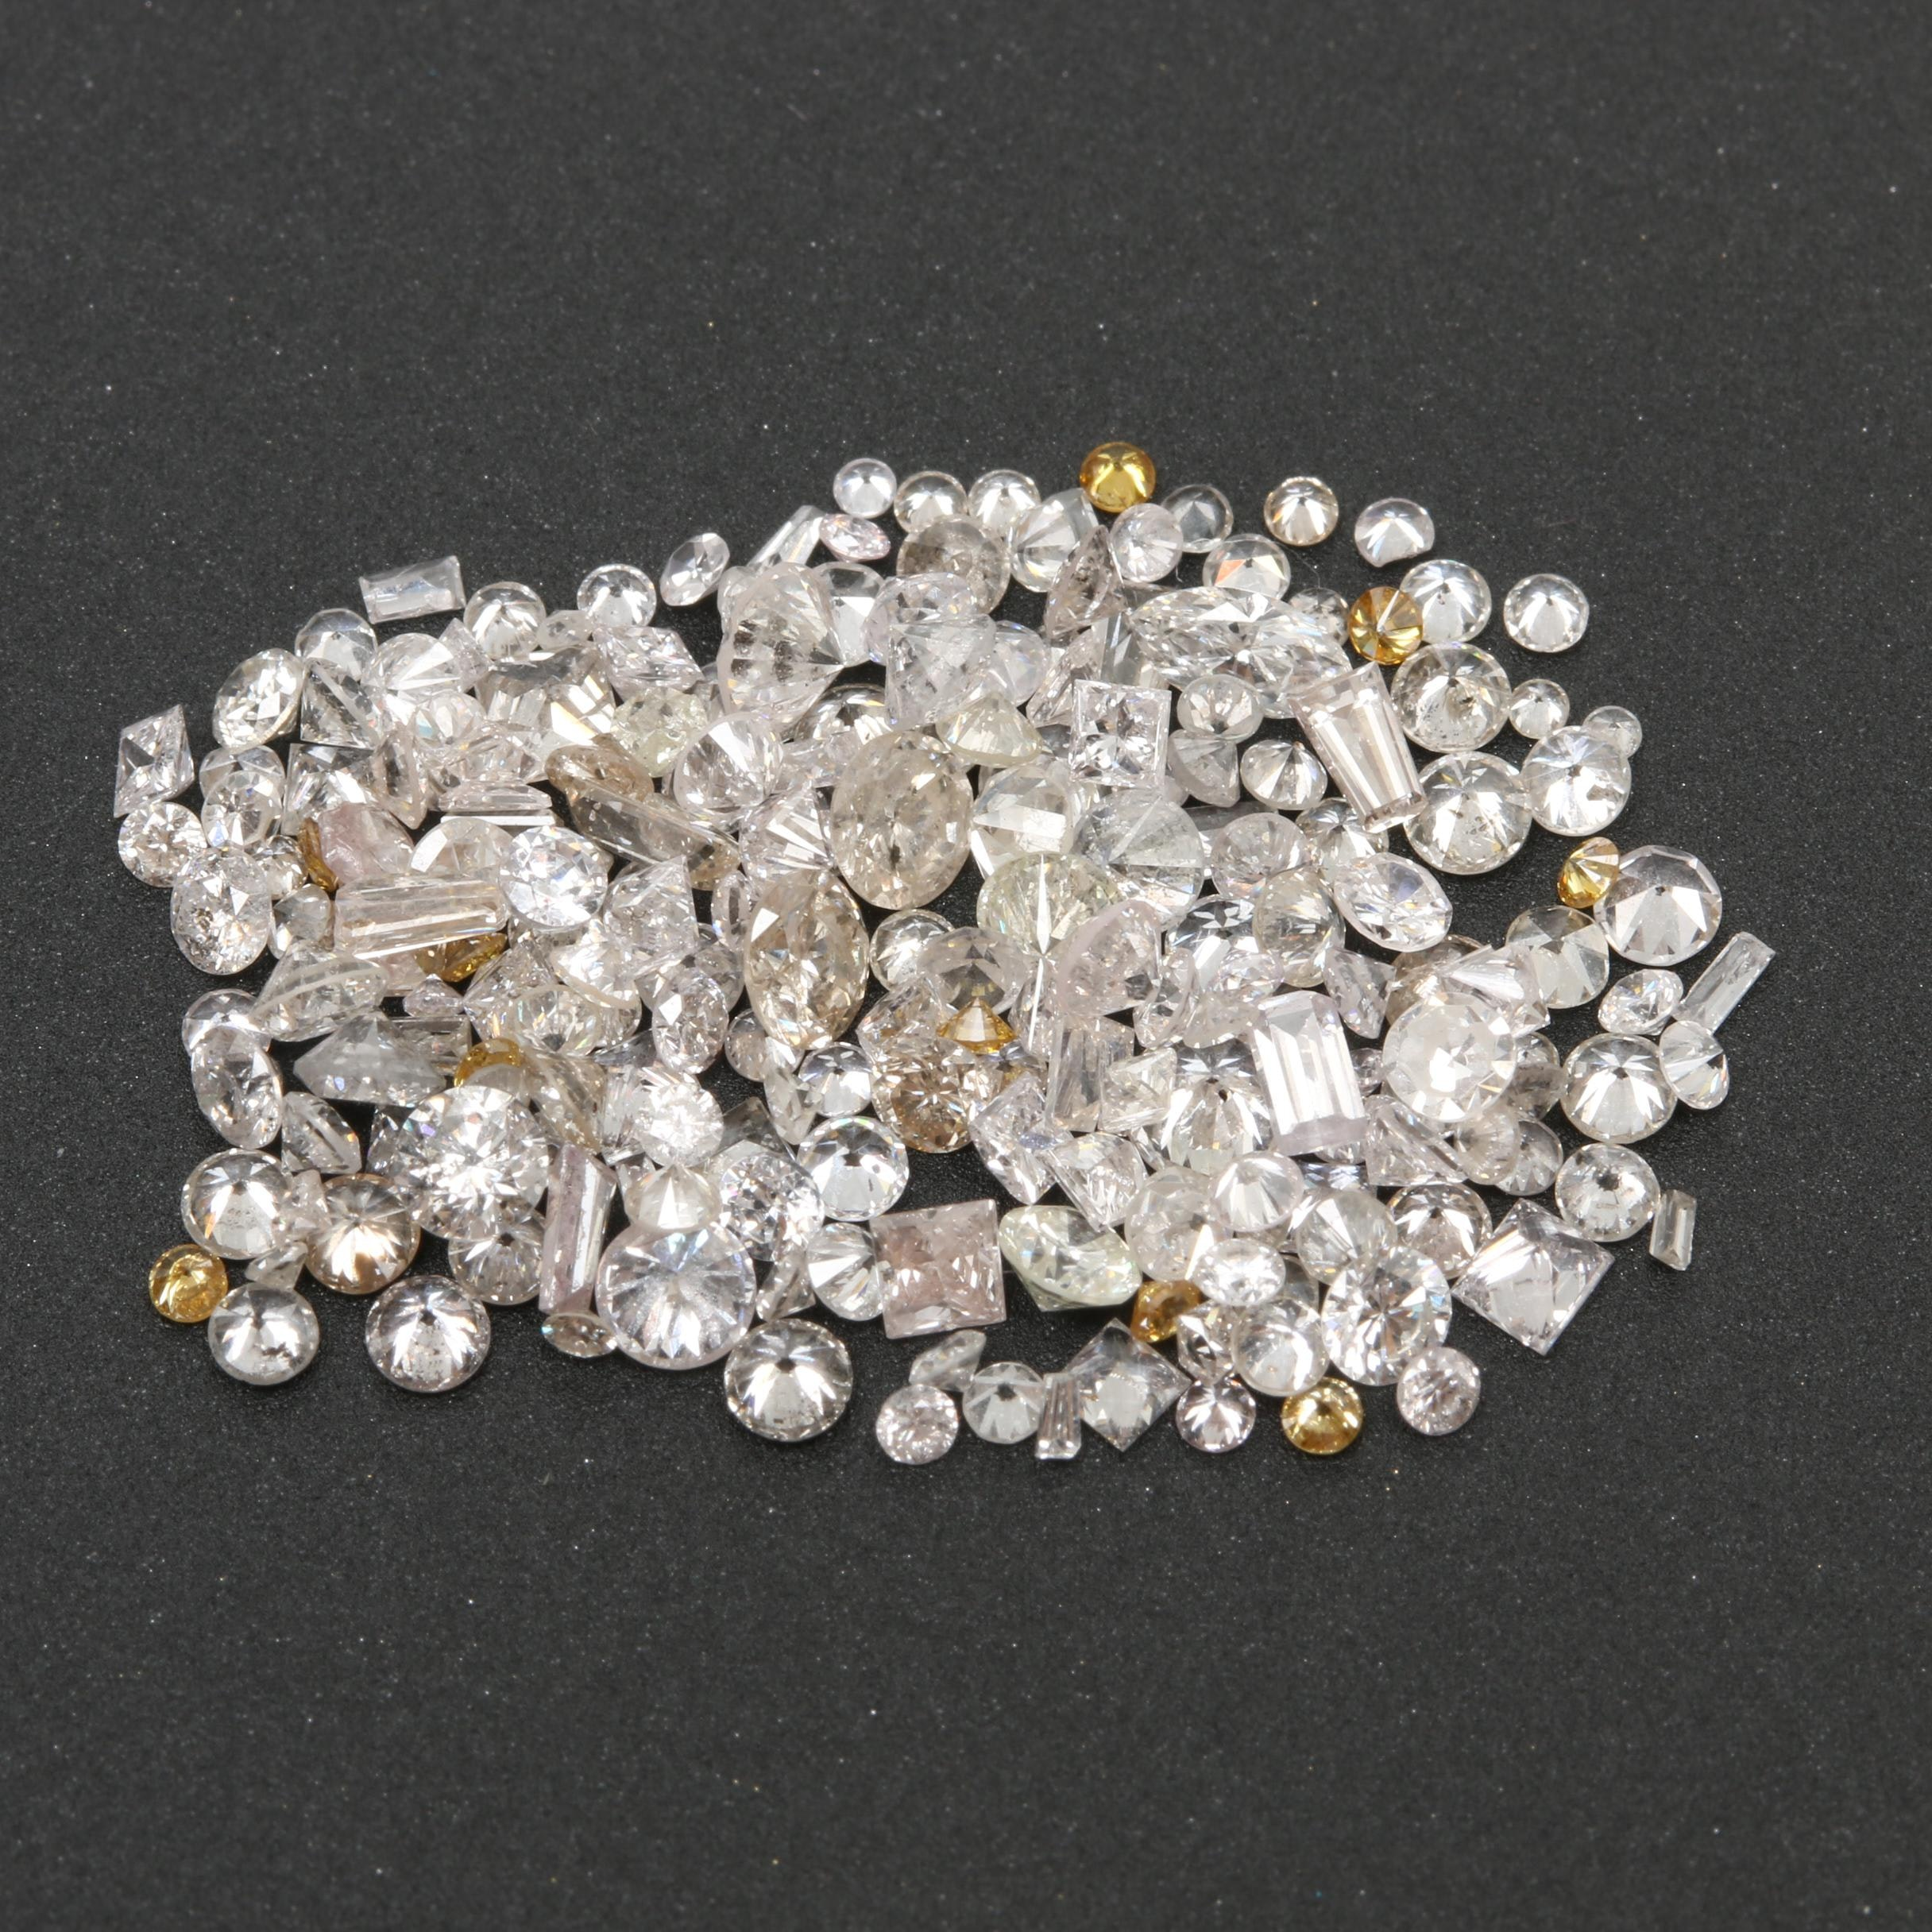 Loose 4.61 CTW Diamond Assortment